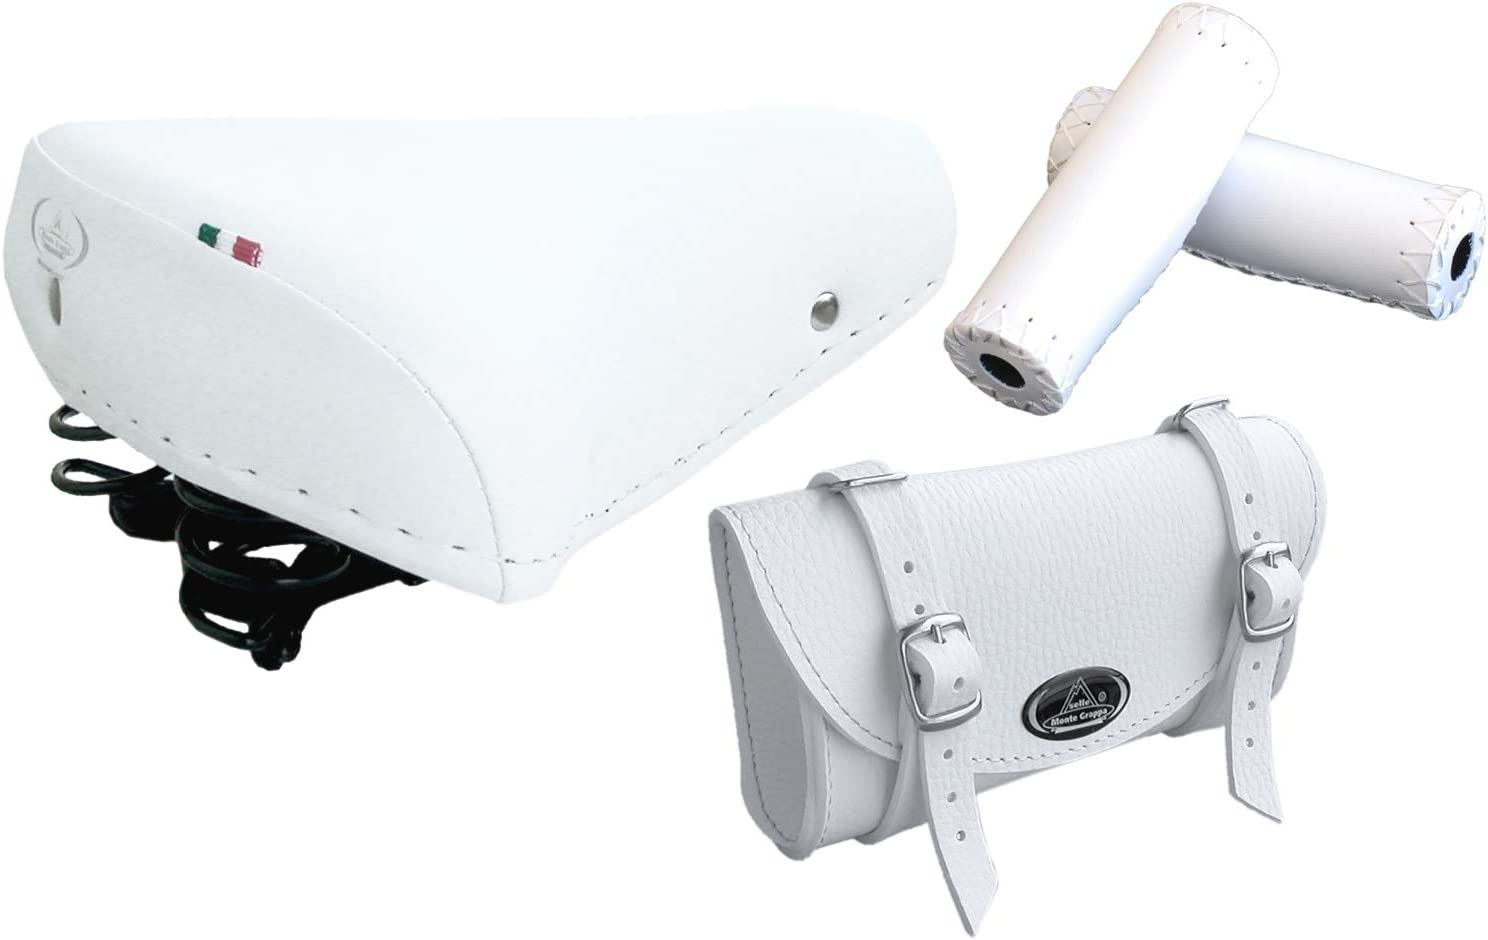 Bag MOD Tris Montegrappa 0016 White Vintage Saddle Model 07//F Grips